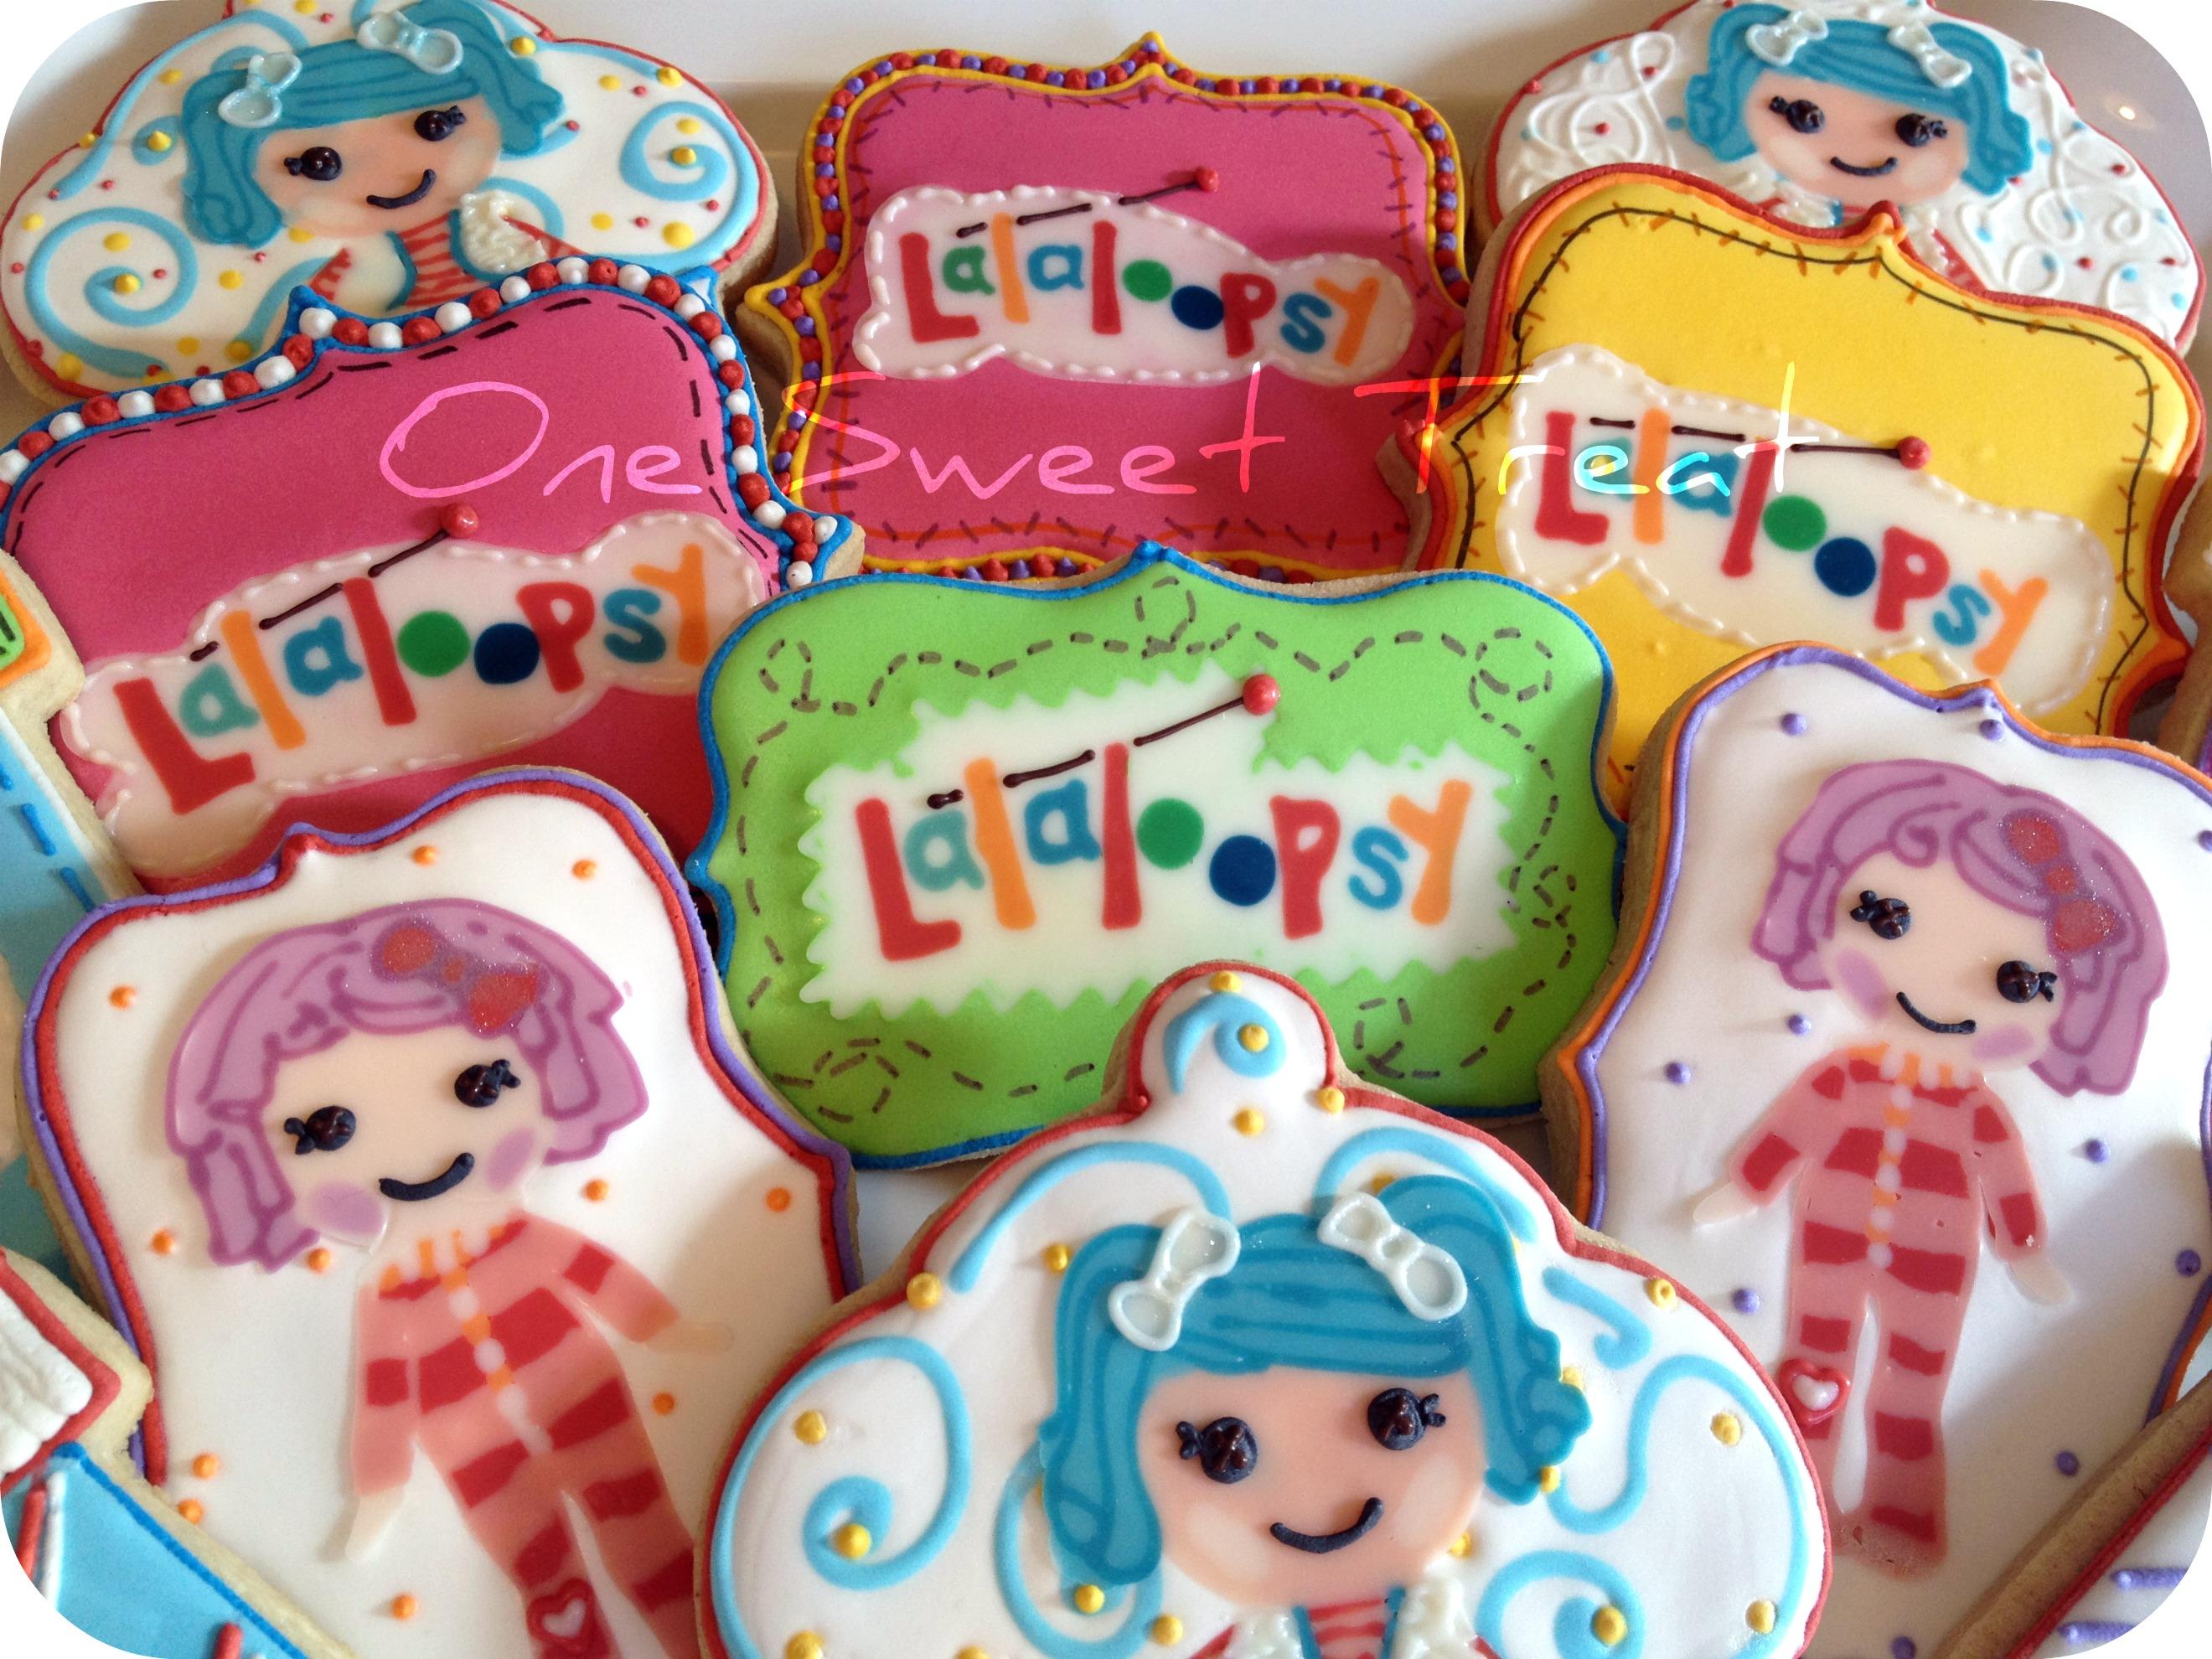 lalaloopsy-dolls-2-ost